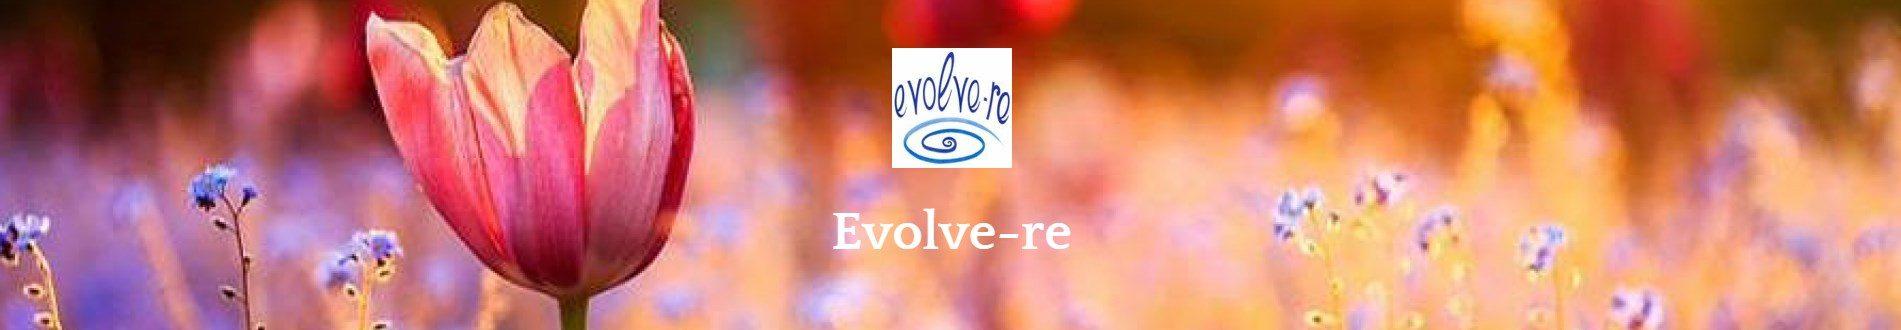 Evolve-re